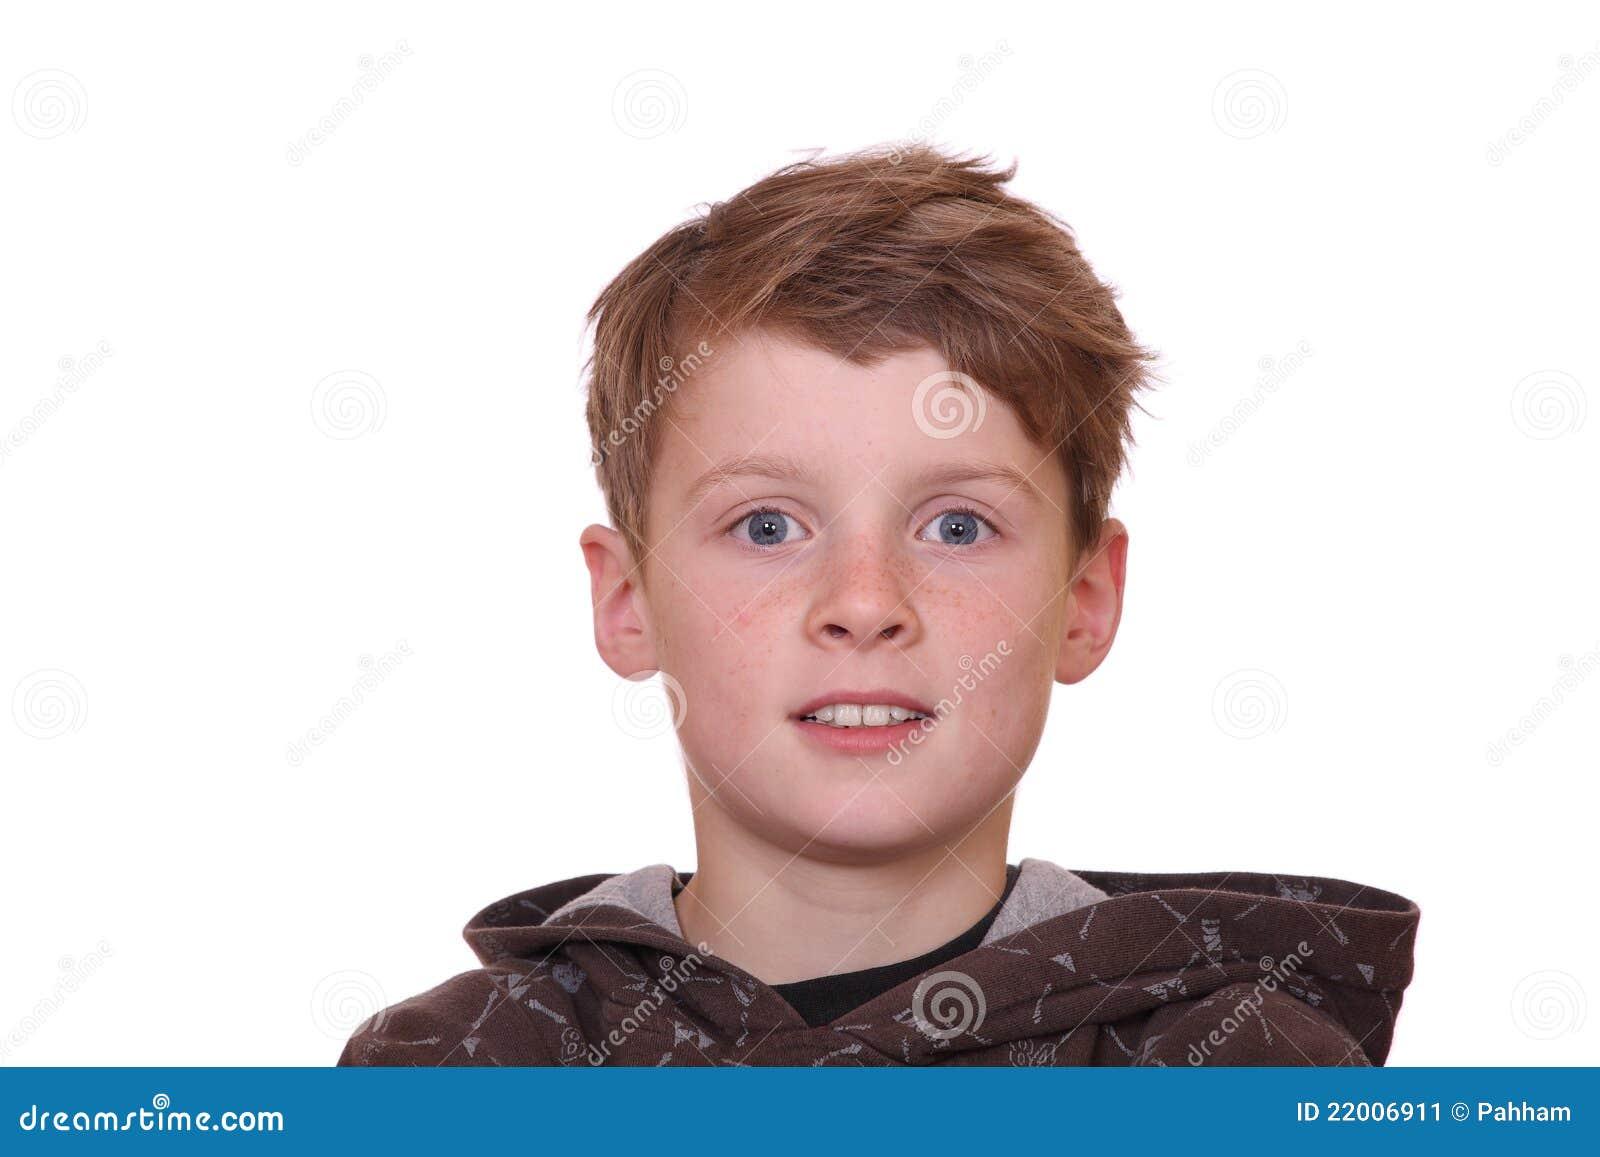 young boy stock image image 22006911. Black Bedroom Furniture Sets. Home Design Ideas